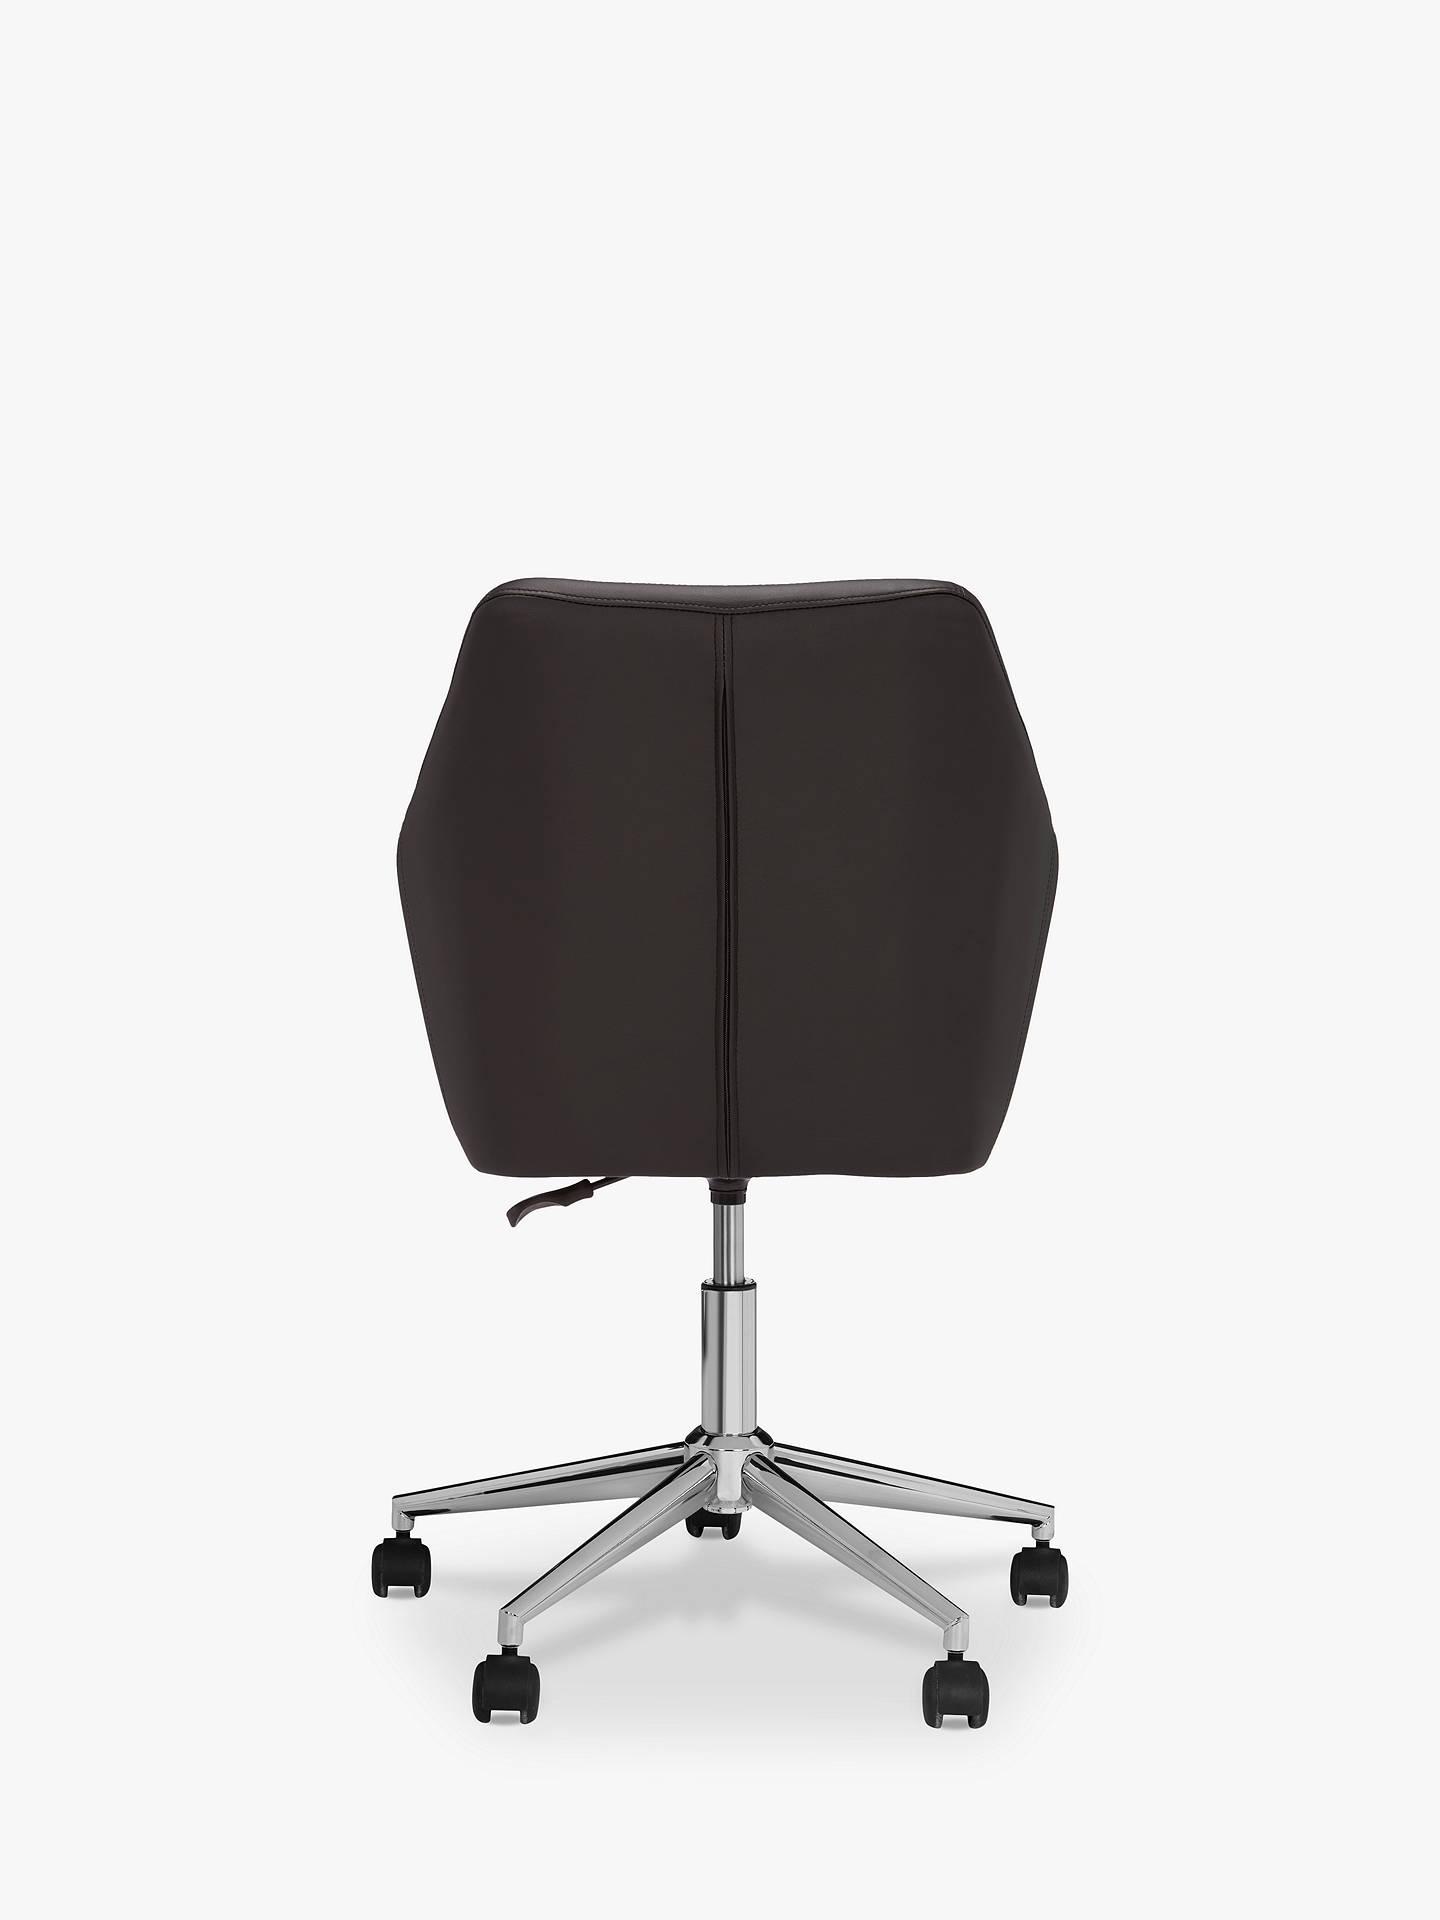 John Lewis Partners Reid Faux Leather Office Chair Black